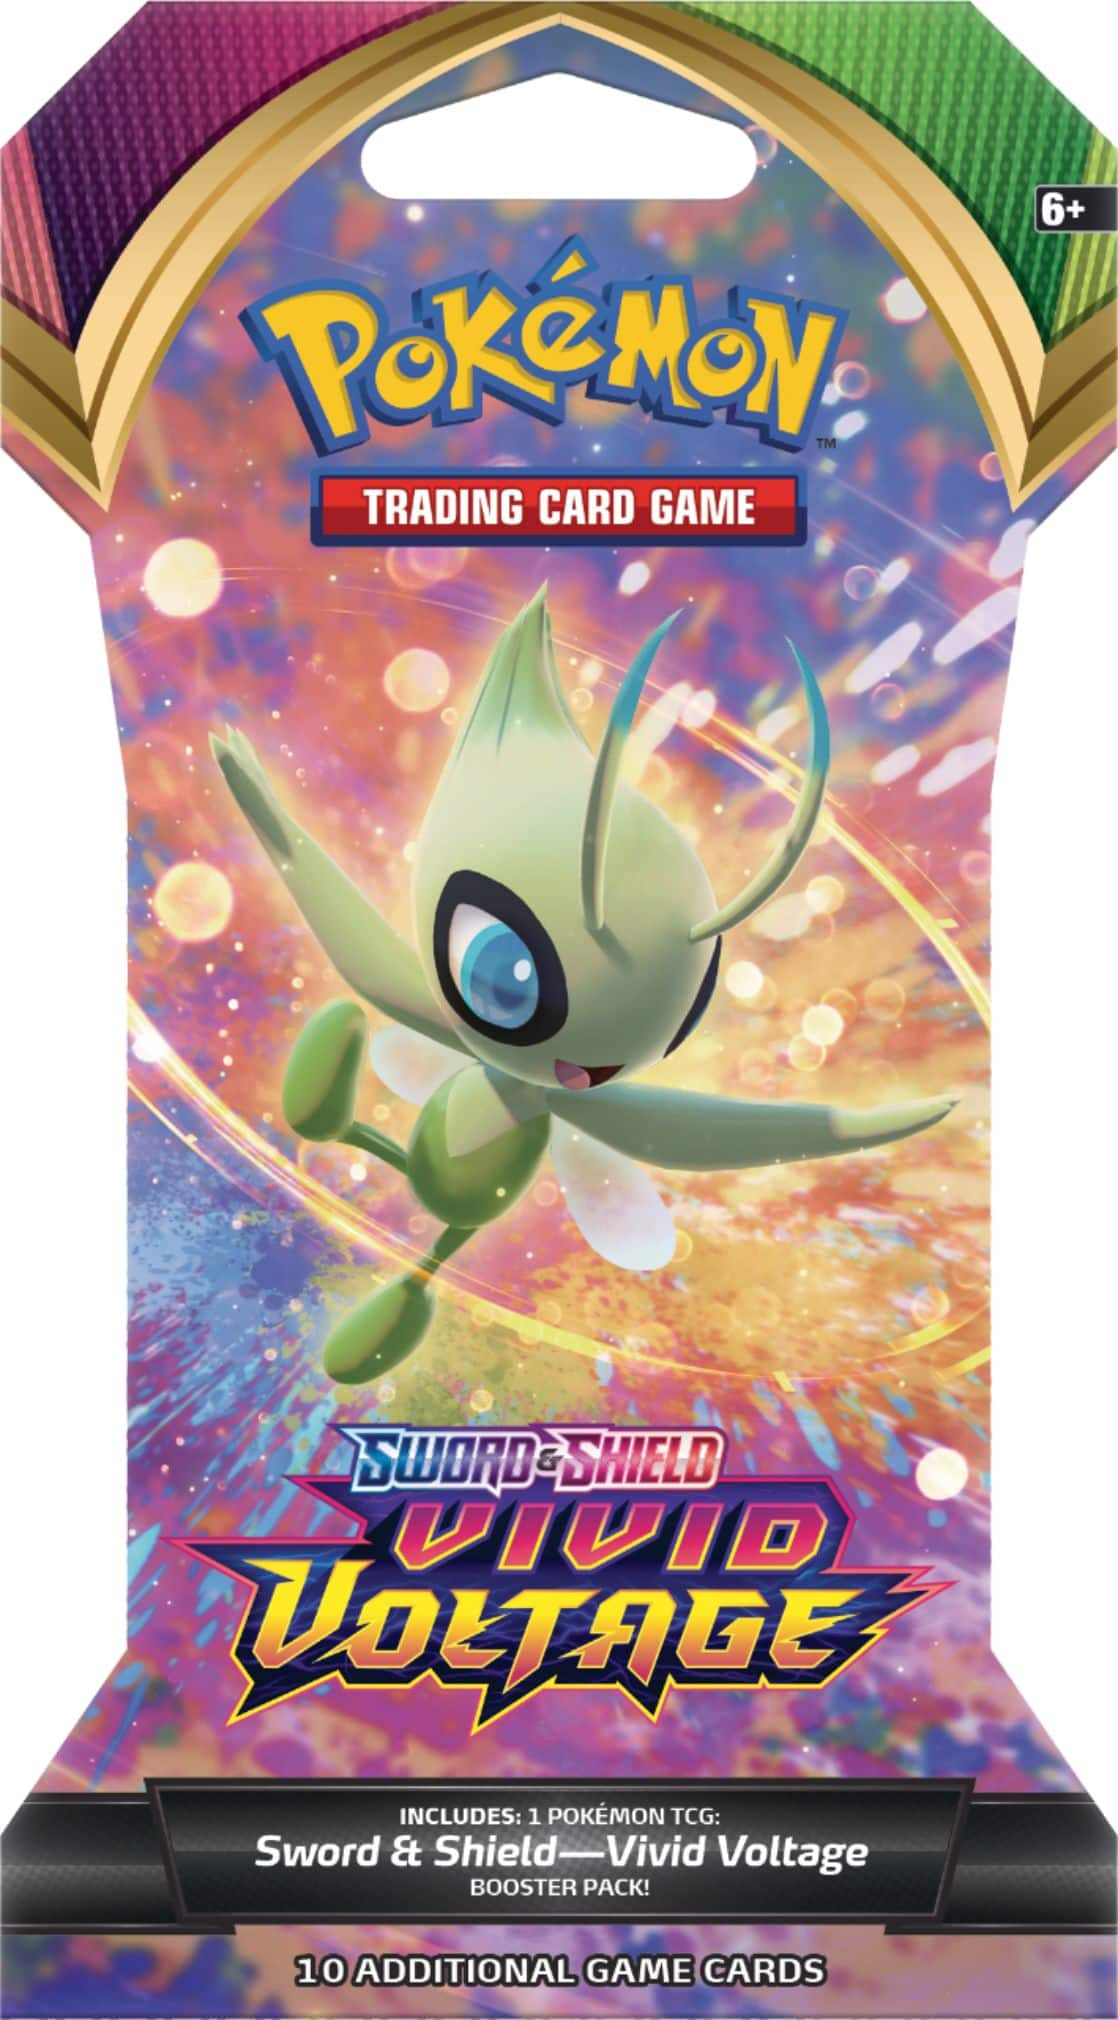 Pokémon TCG: Sword & Shield—Vivid Voltage Sleeved Booster 175-82750 - Best Buy $3.99